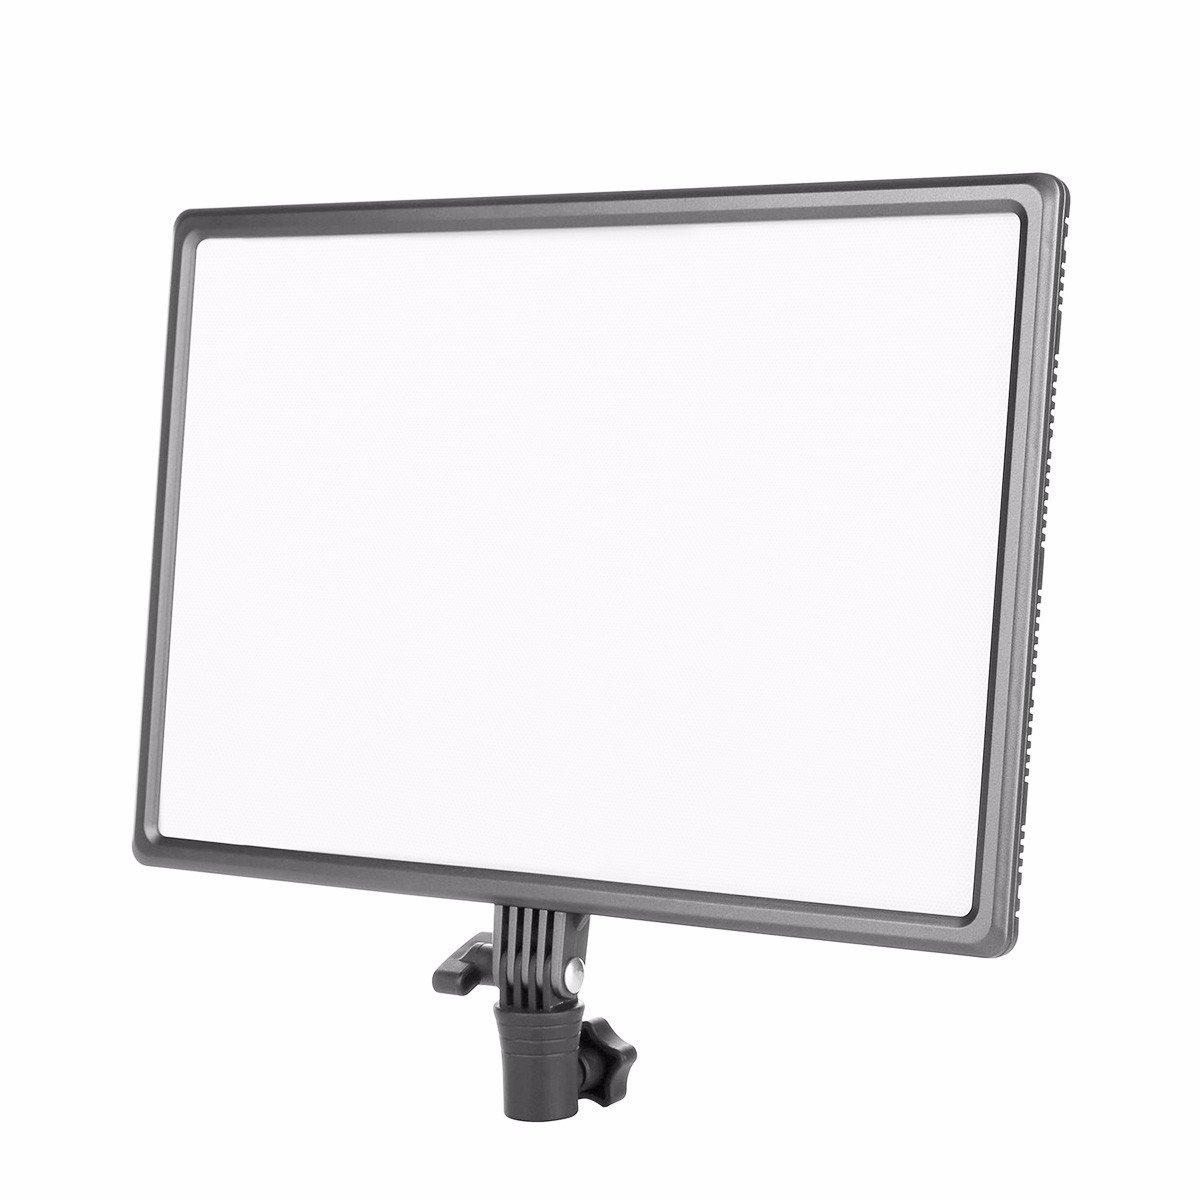 Eoogere LED ビデオライト 超薄型 カメラ&ビデオカメラ写真撮影用ライト 3200K-5600K 色温度輝度調整 AC電源アダプター付き Led ライト+AC アダプター  B01N95N7AW